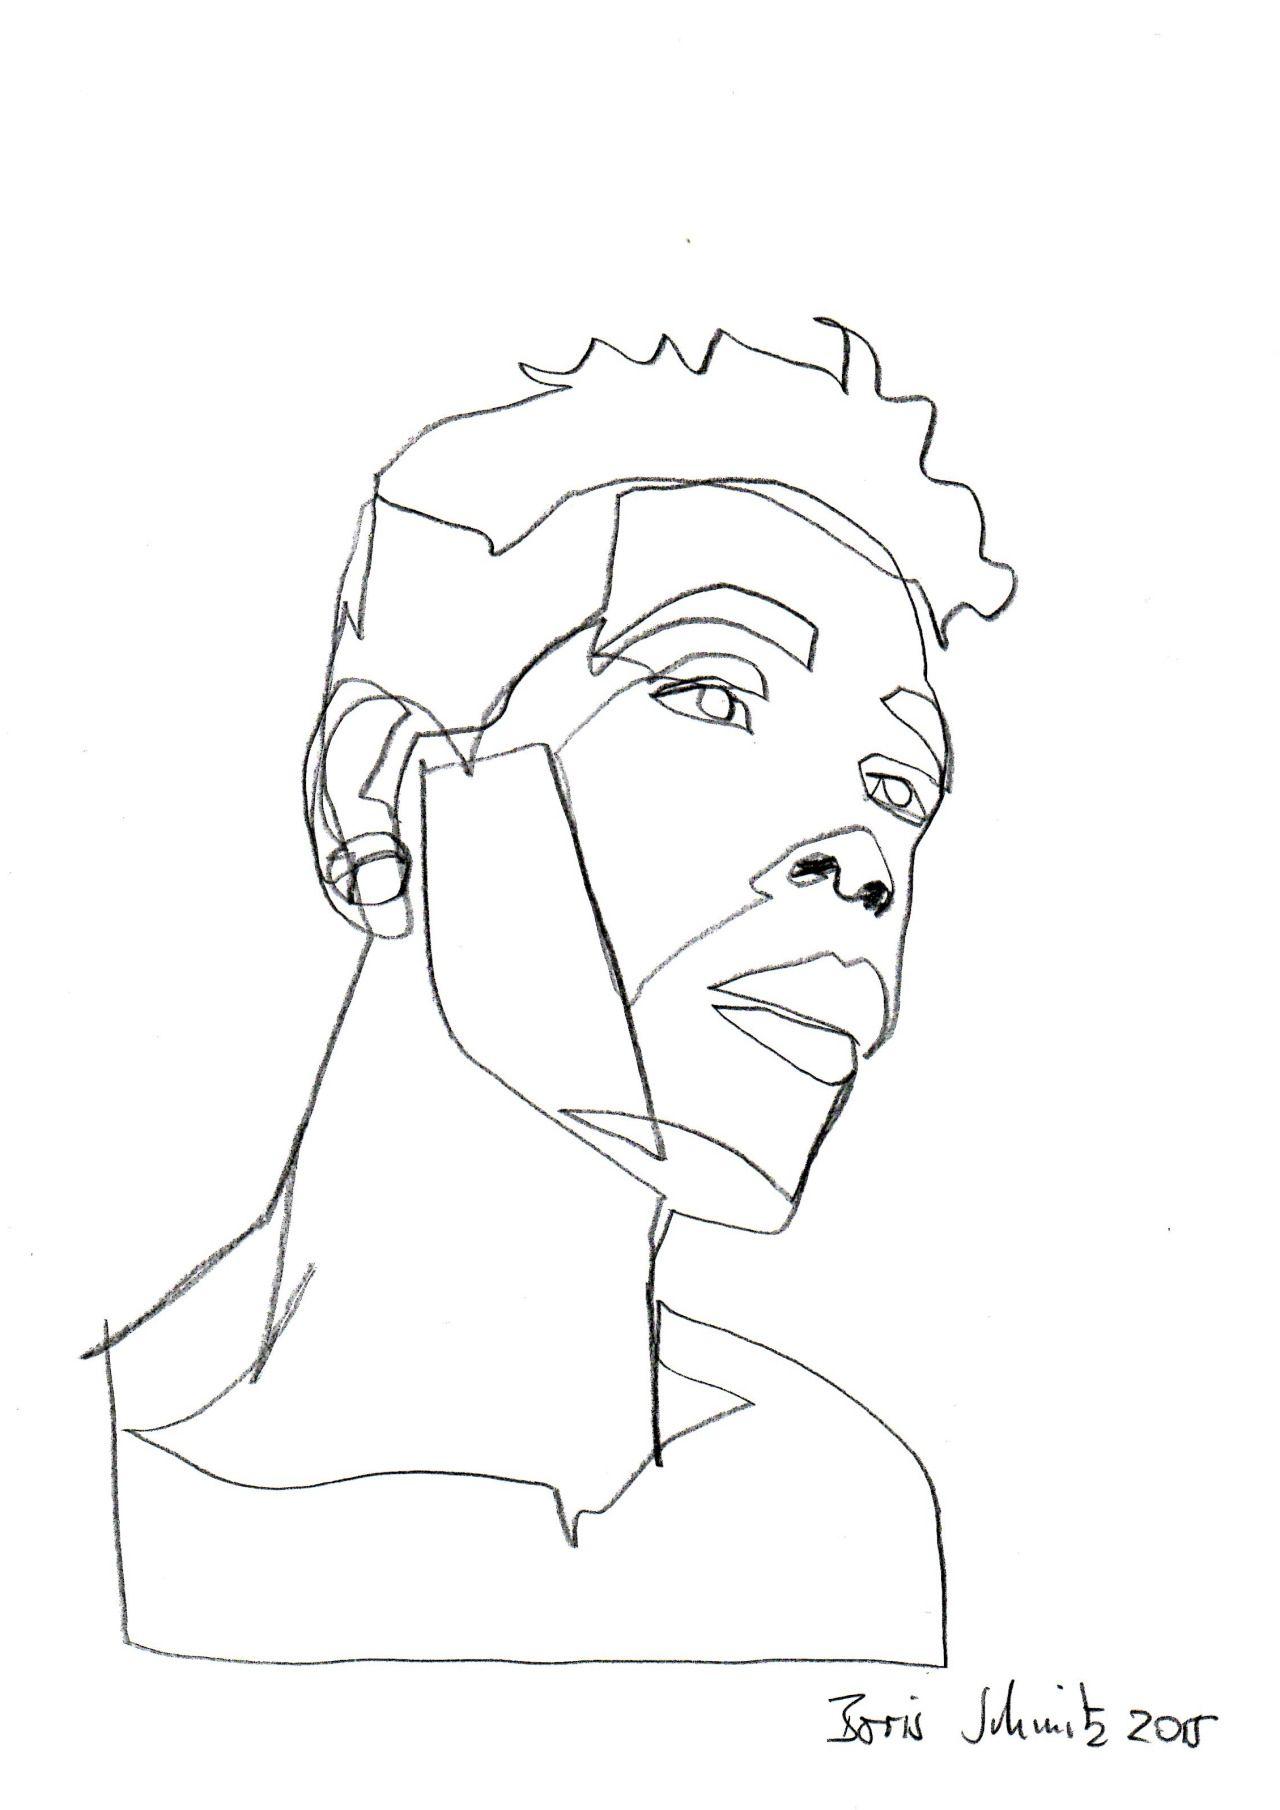 One continuous line drawing boris schmitz art for Art of minimal boris